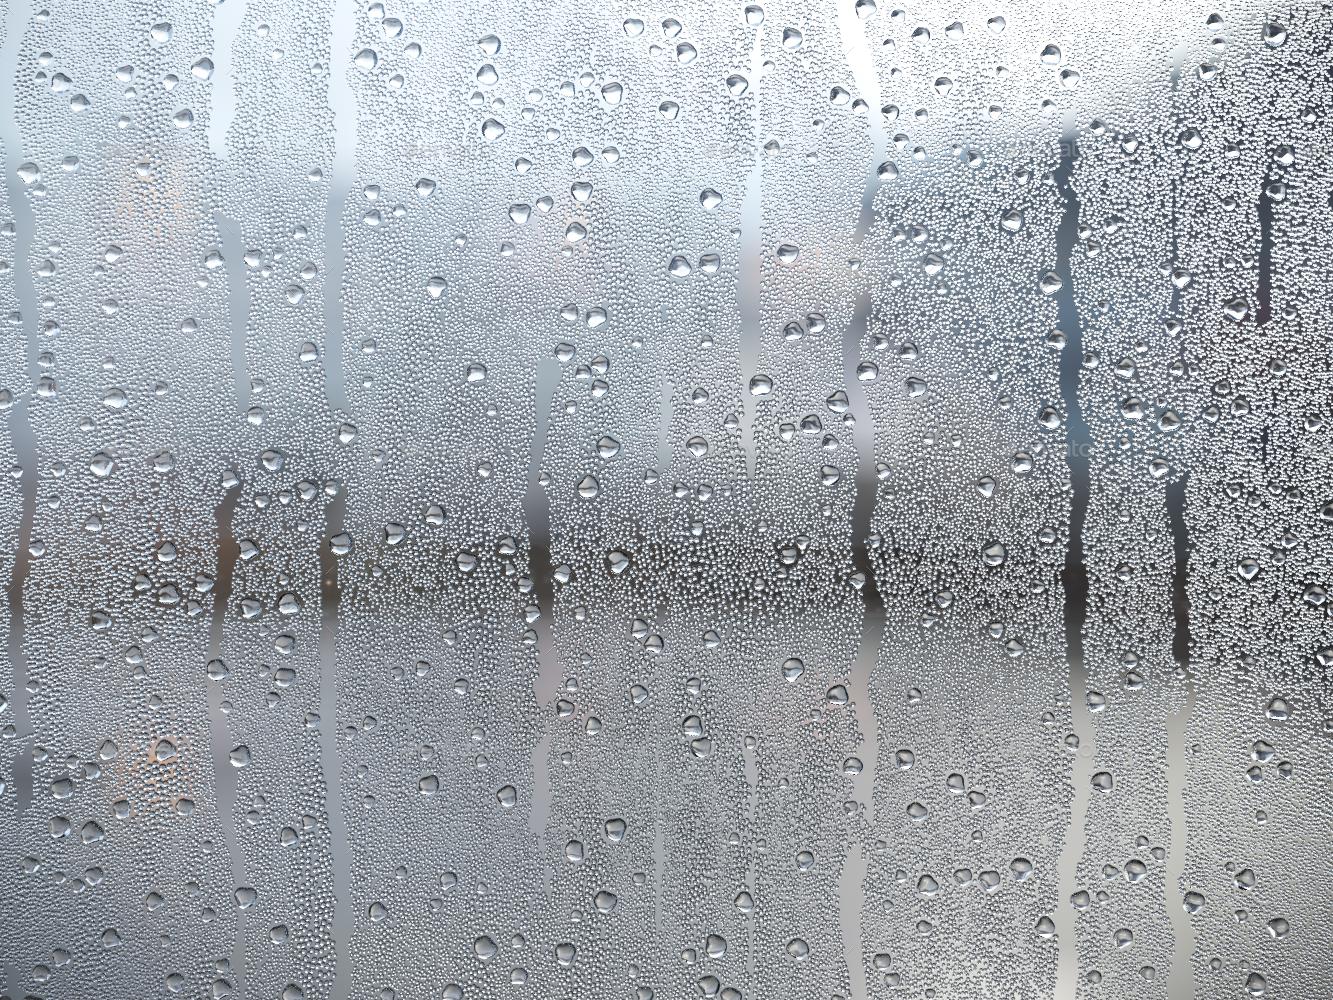 Raindrops Texture Raindrops Texture Texture Abstract Artwork Rain Drops